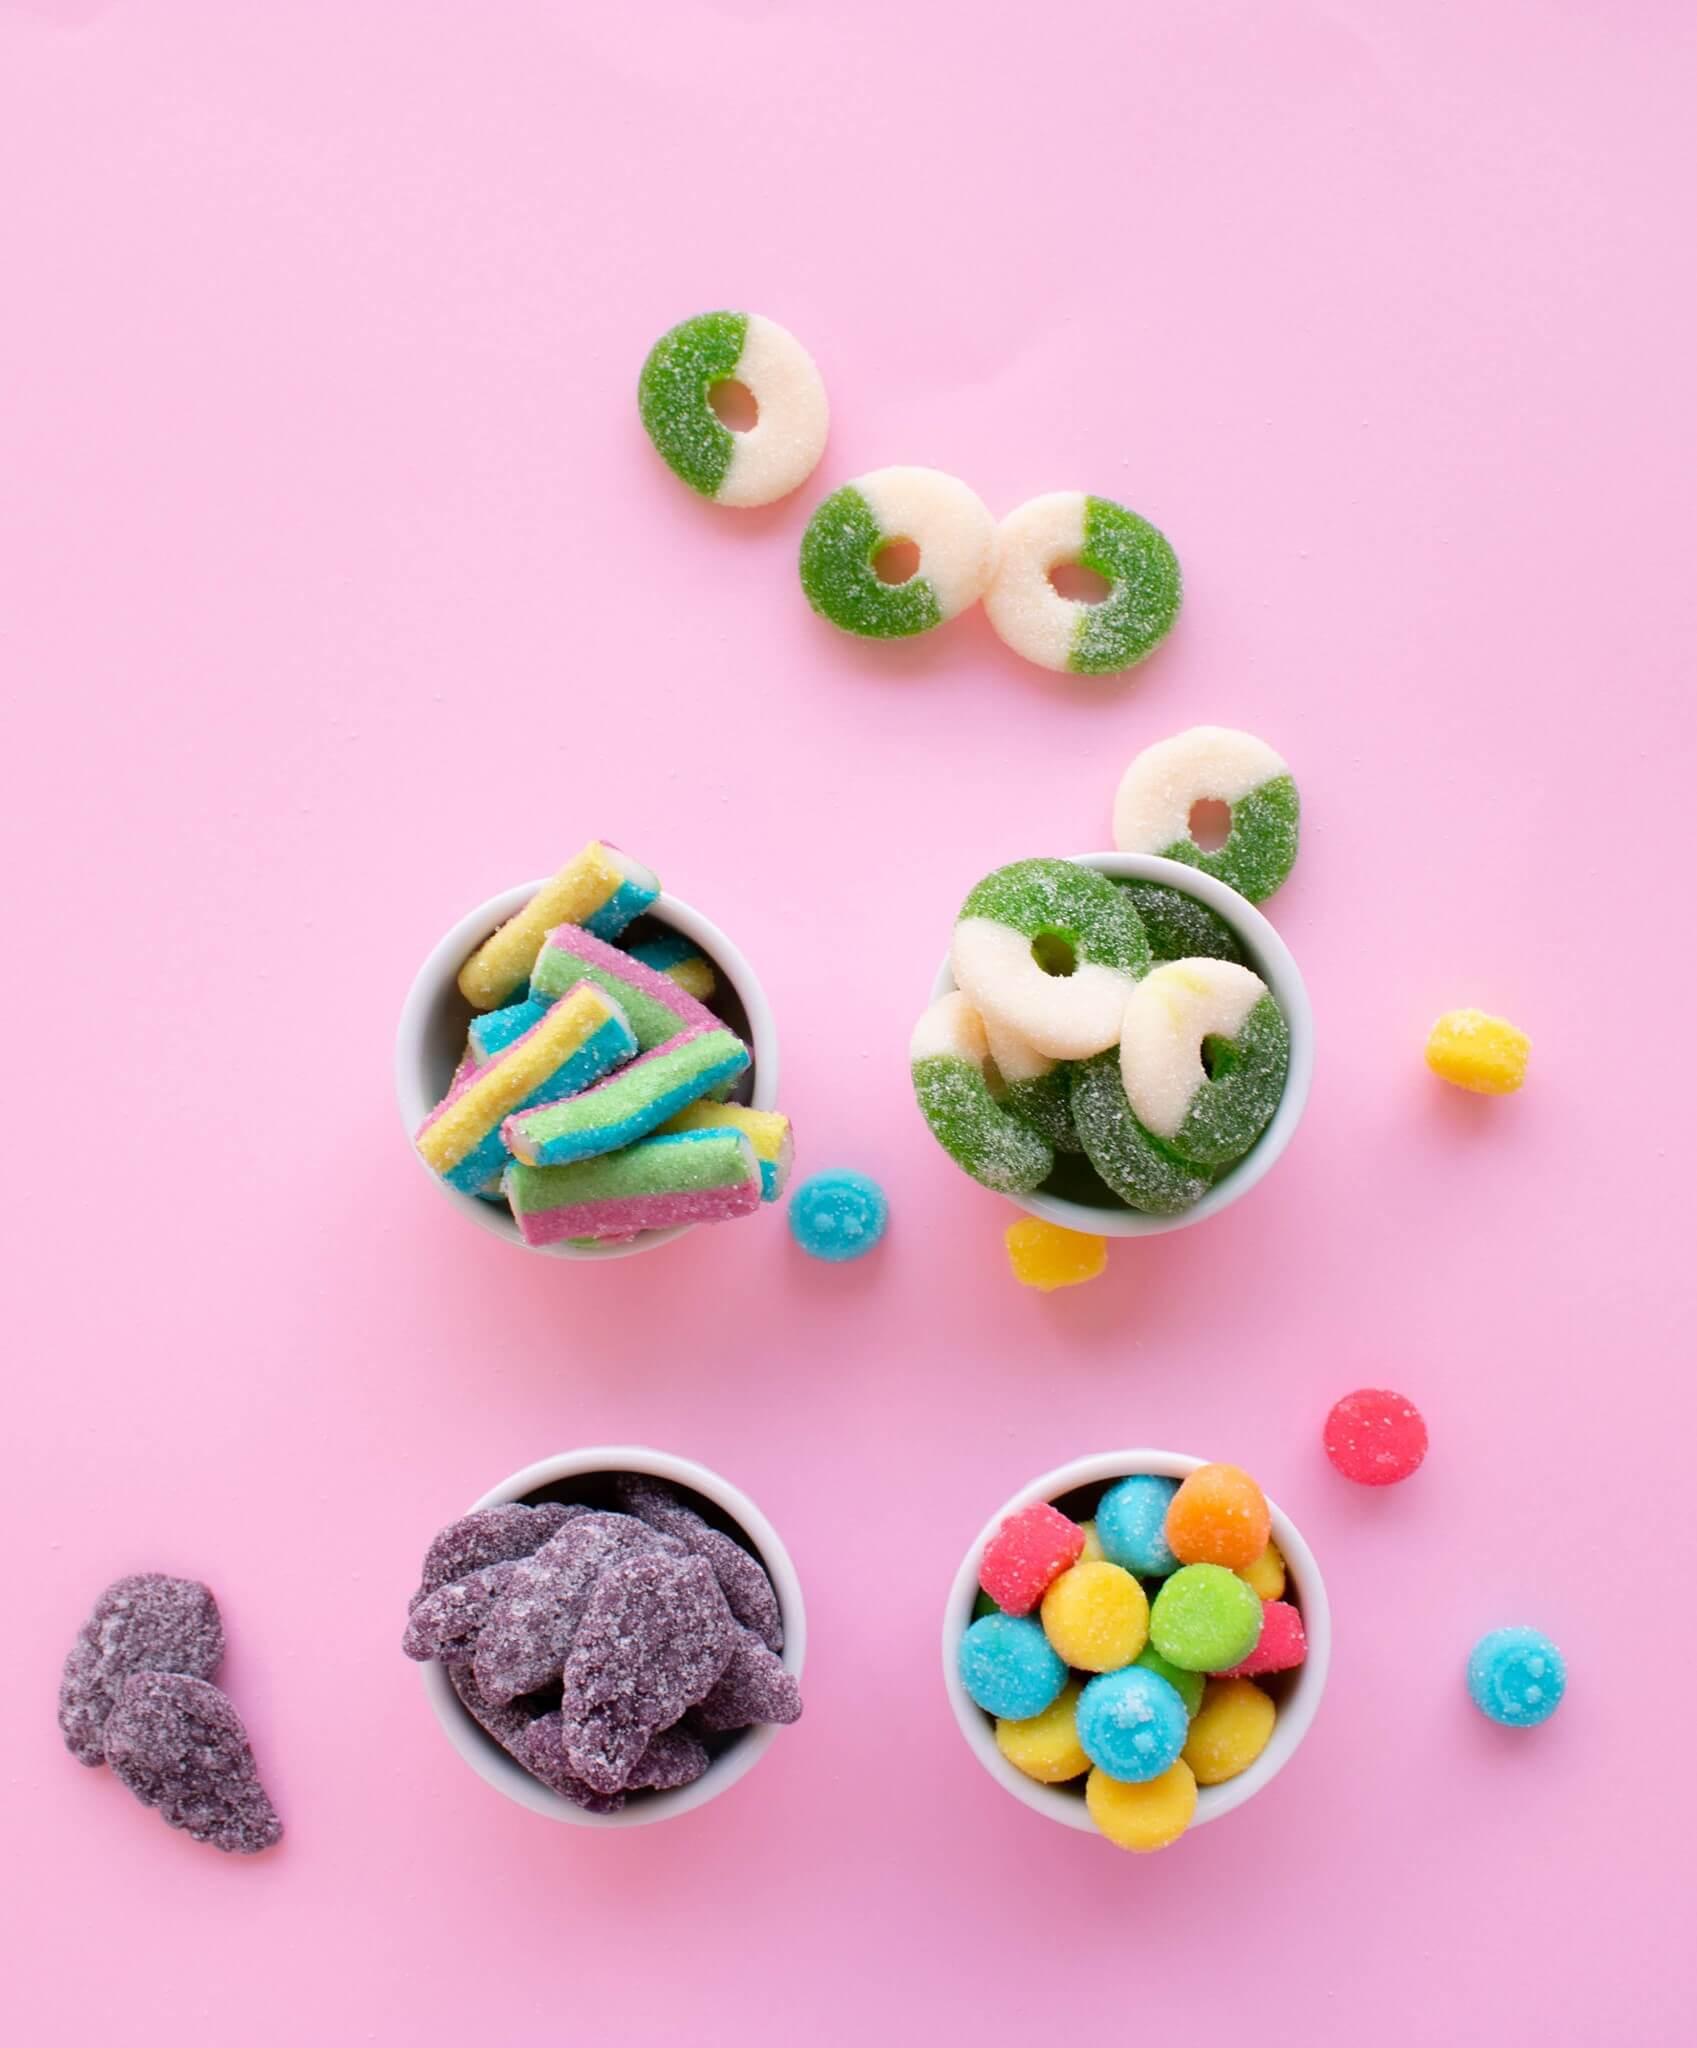 bonbons sucreries sans gluten